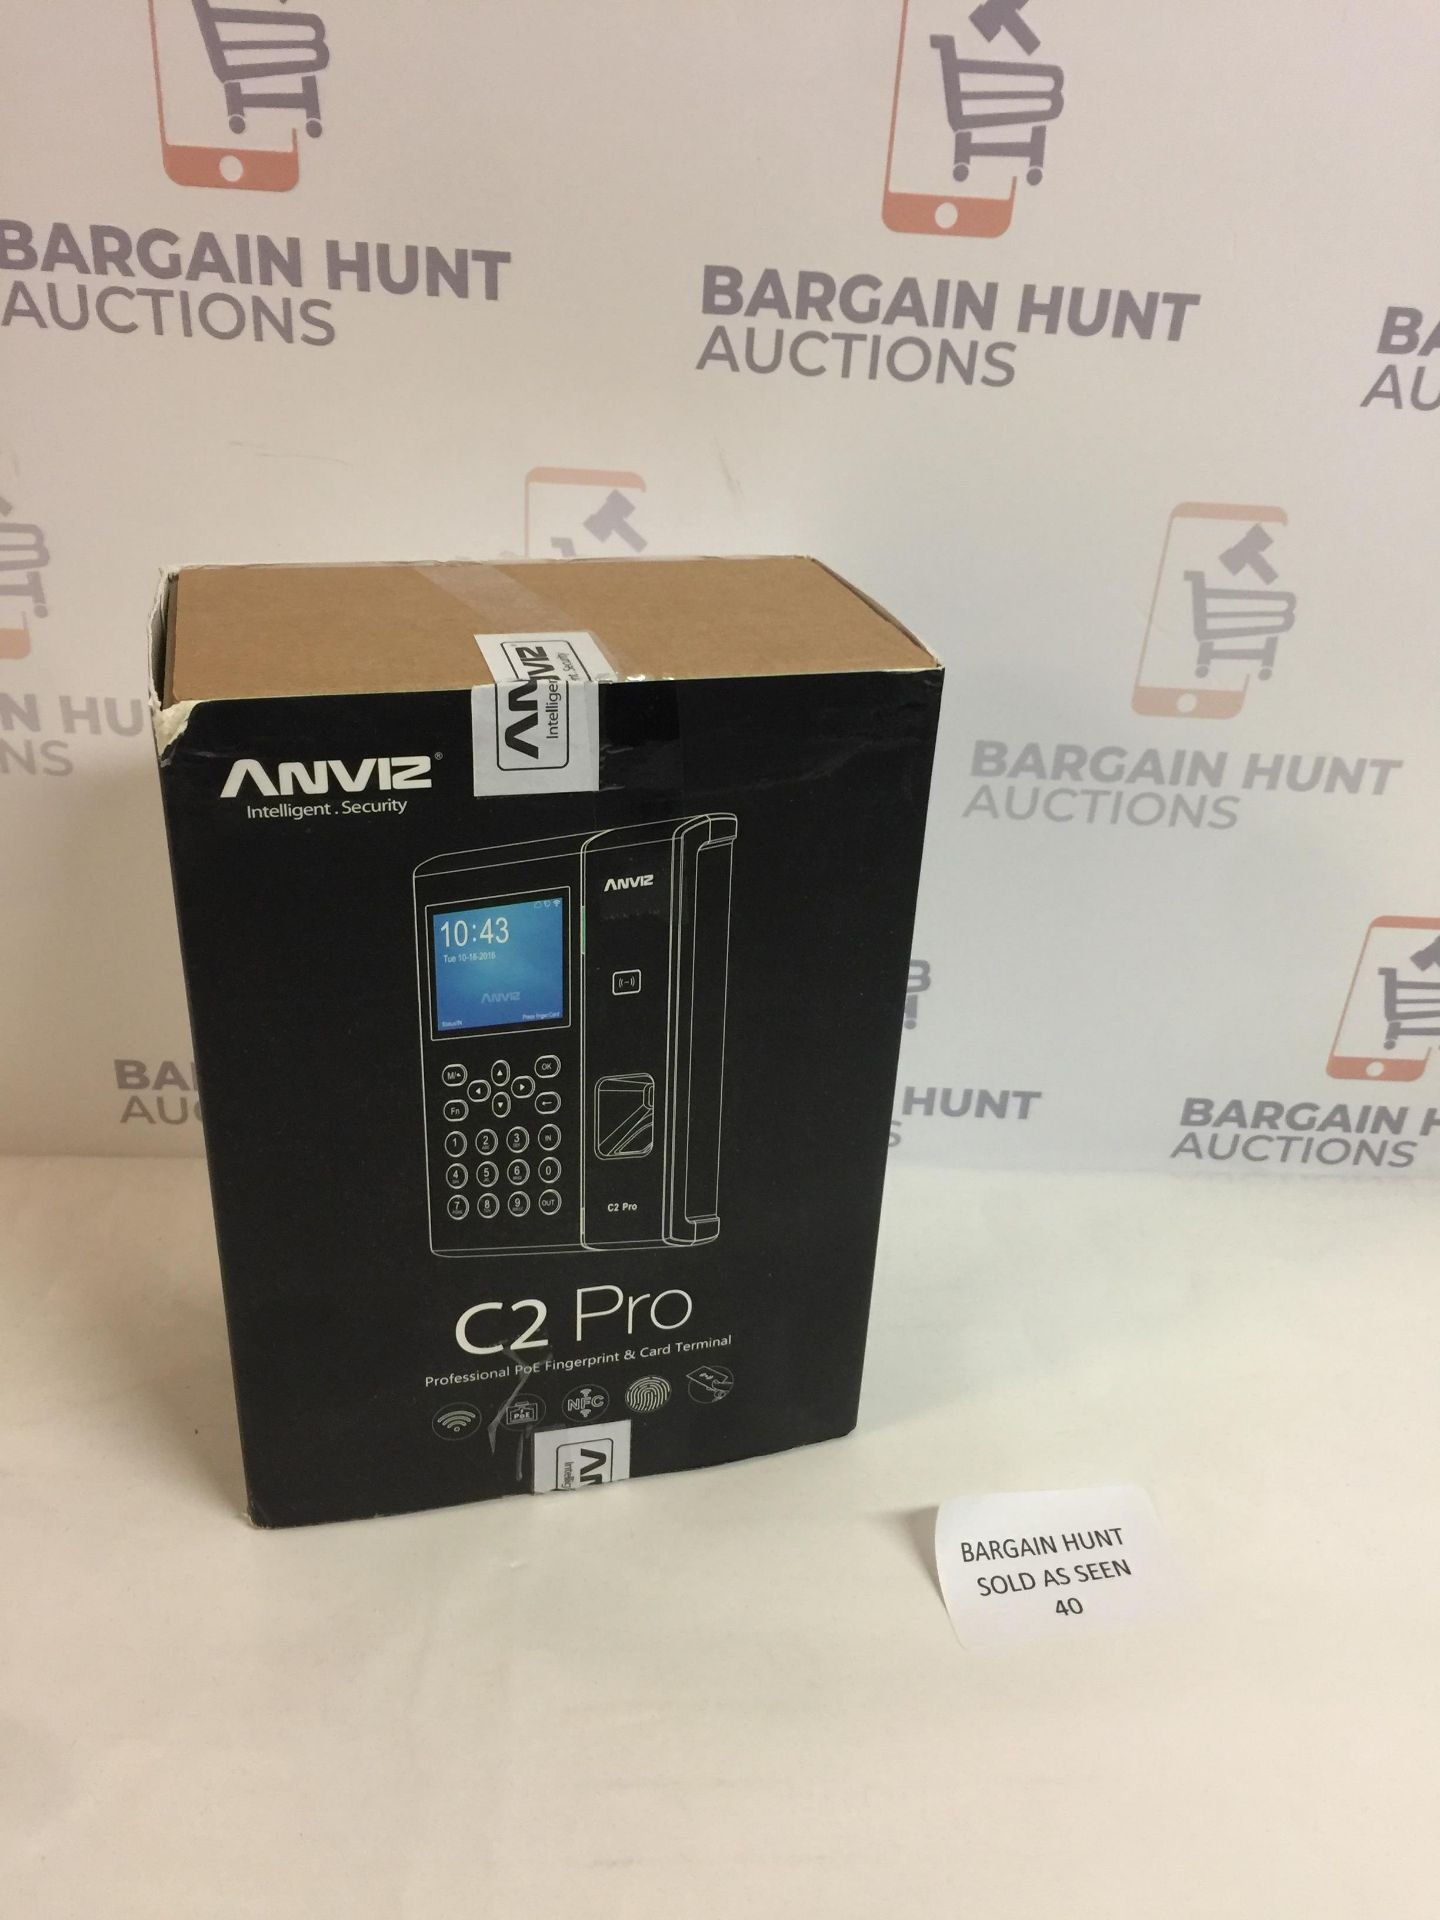 Lot 40 - Anviz C2 Pro - Access Control Professional POE Fingerprint & Card Terminal RRP £199.99